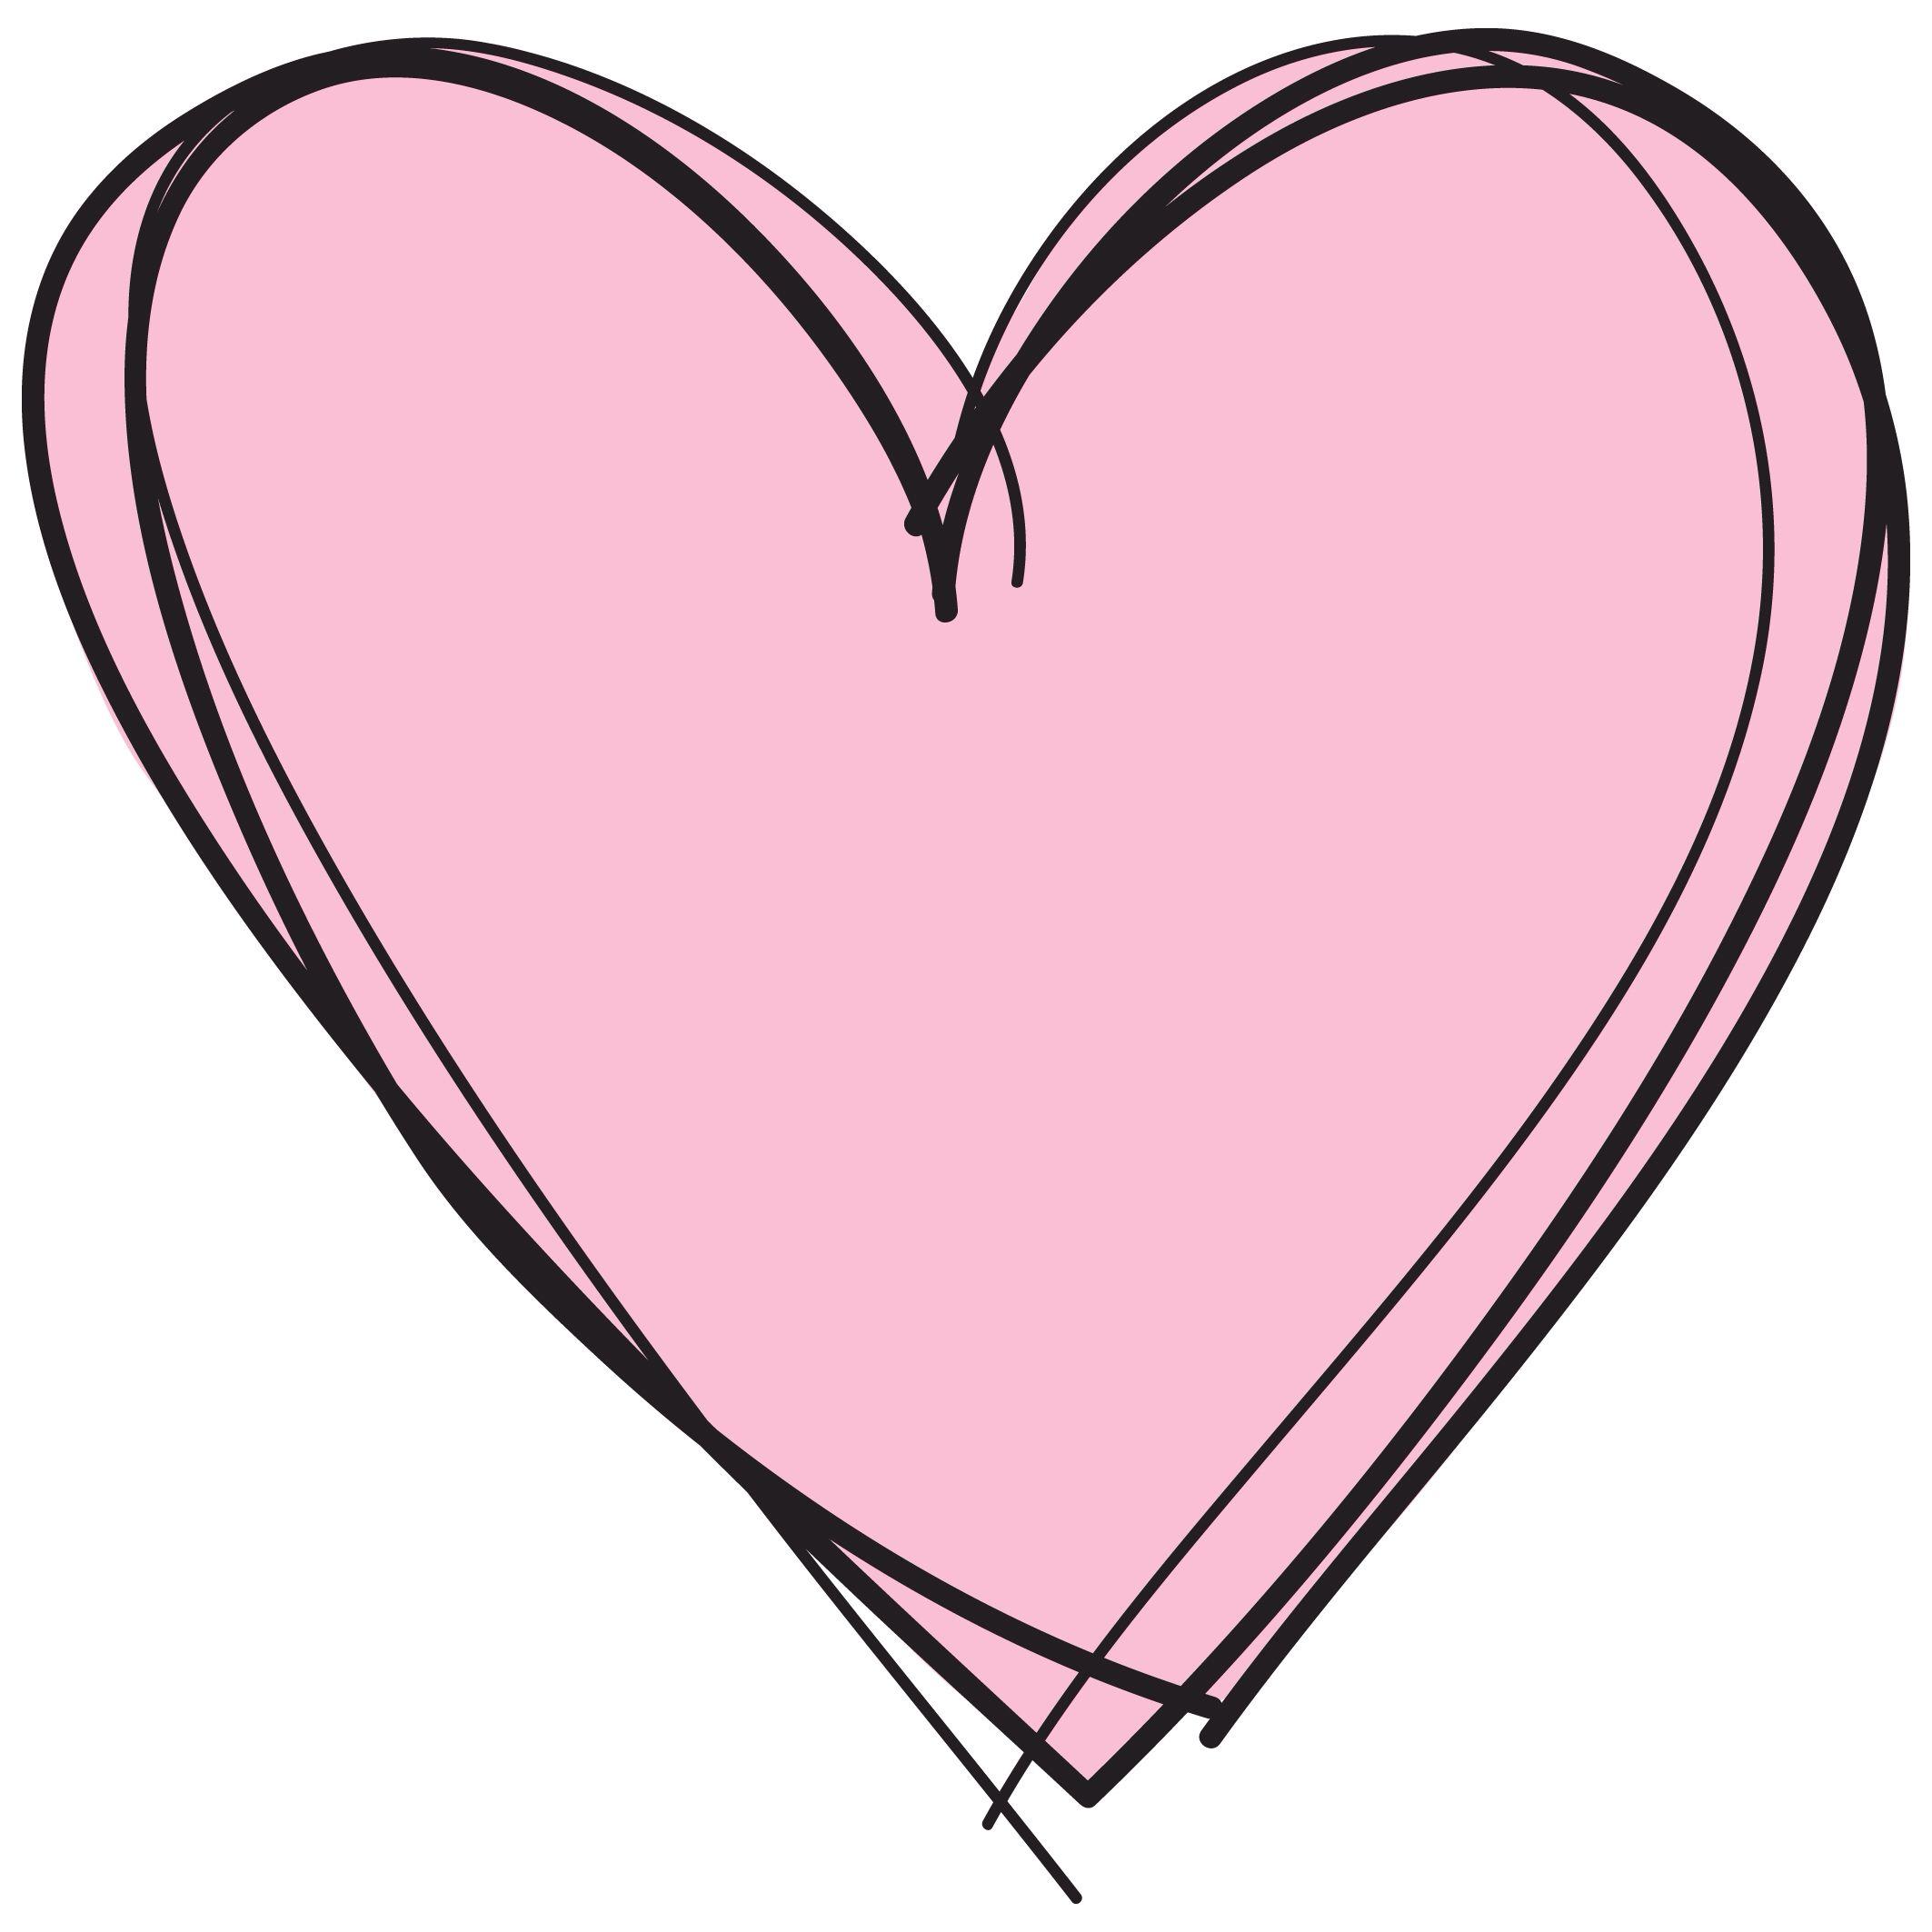 Pin De Gallia Kallivazi I Love Th En Hearts Dibujos De Corazones Imagenes De Corazon Corazones Tumblr Png